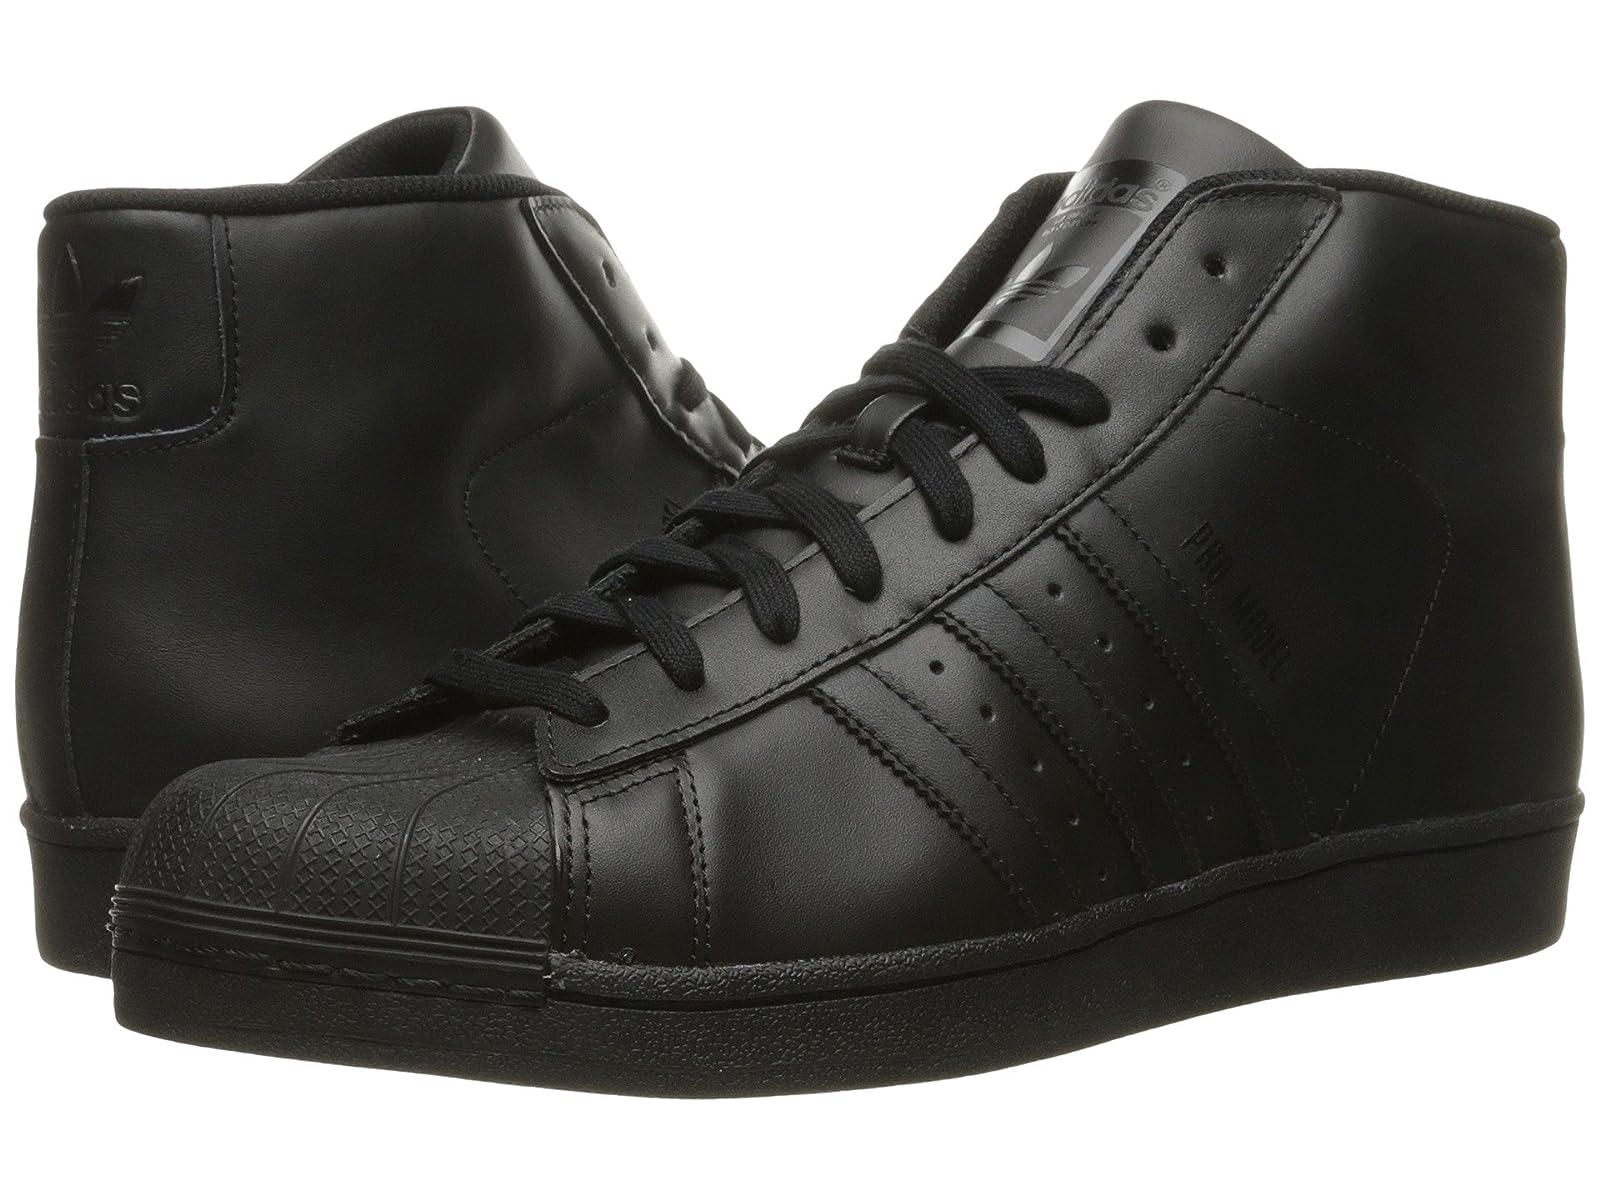 adidas Originals Pro ModelAtmospheric grades have affordable shoes